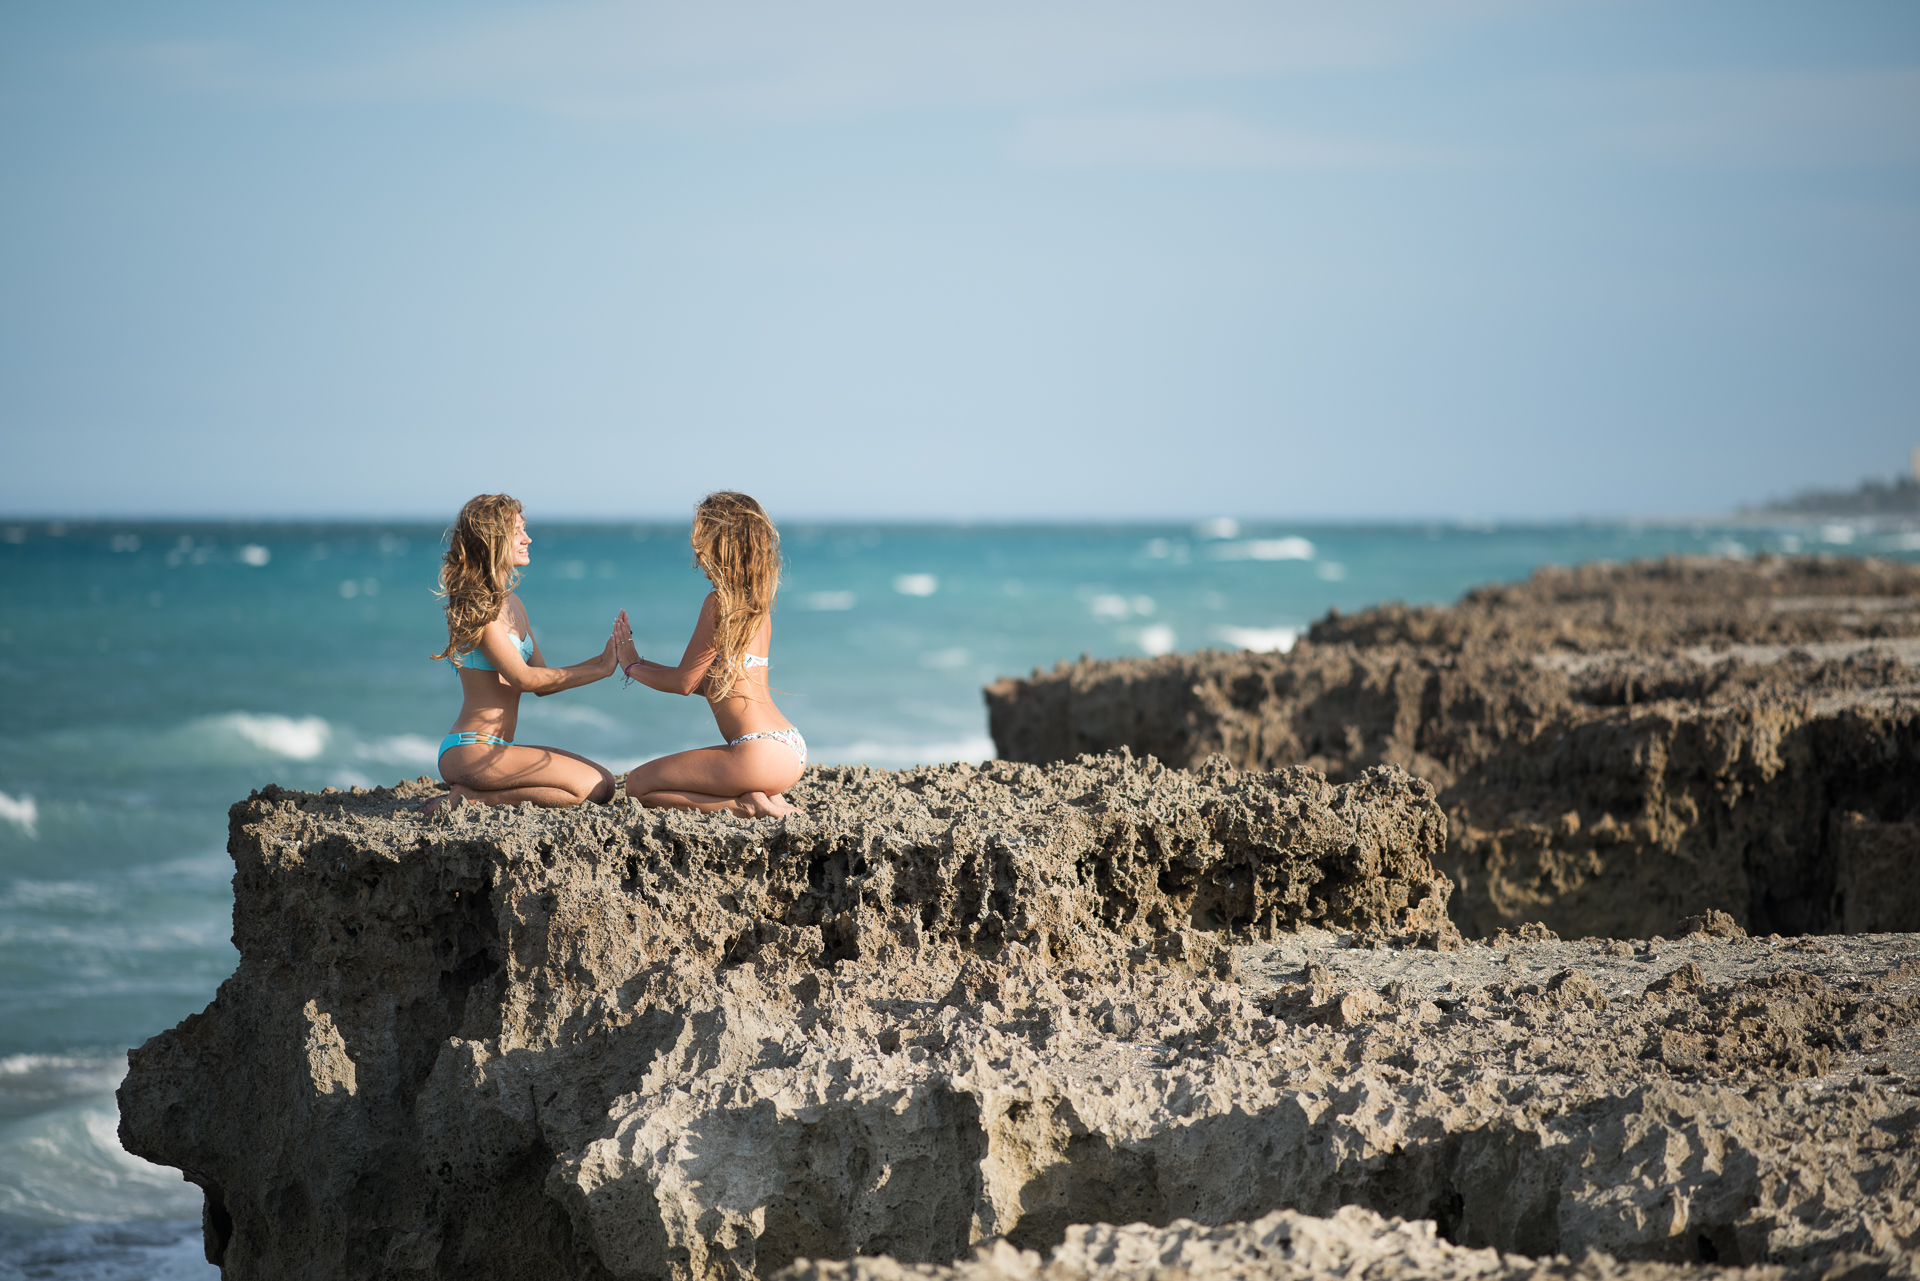 bahamasgirlblowingrocks-220.jpg